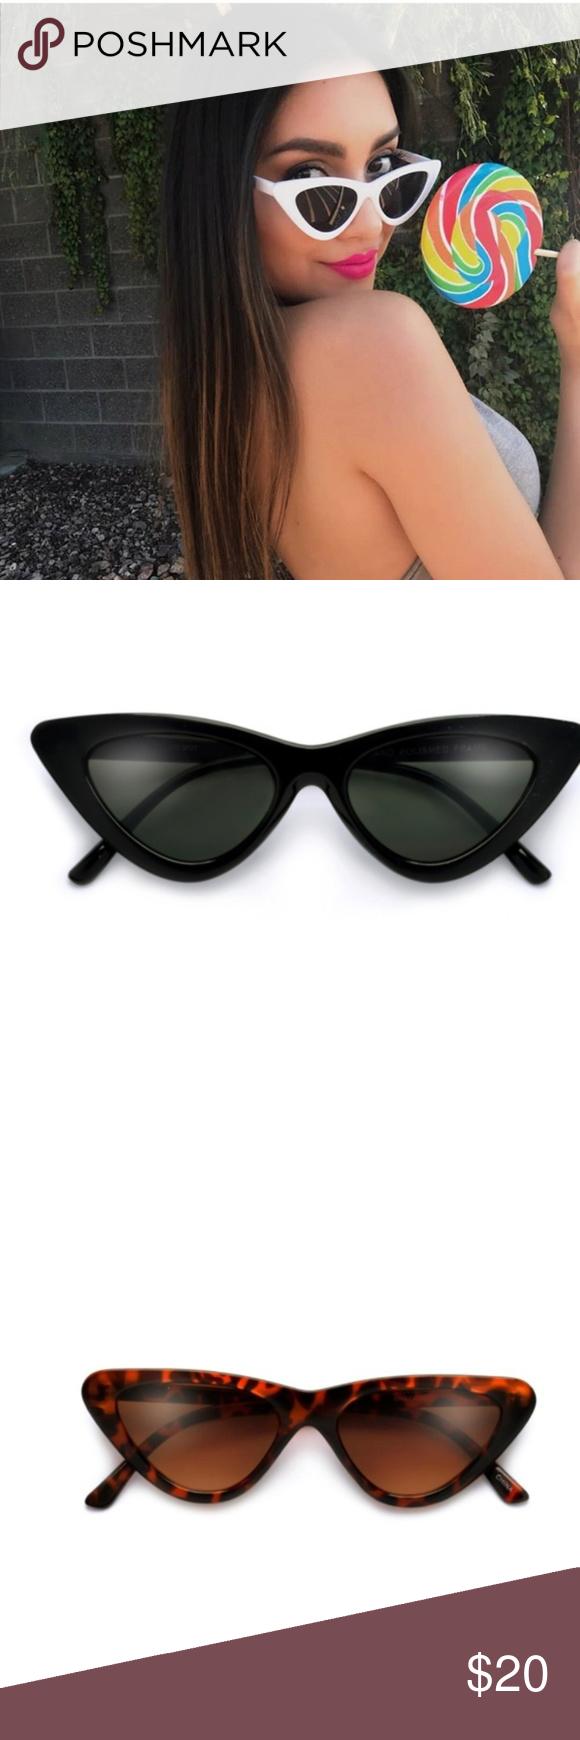 ce1332fb48b Last Slim Lolita Streamlined Cat Eye Sunglasses NWT! Hottest new designer  glasses the slim